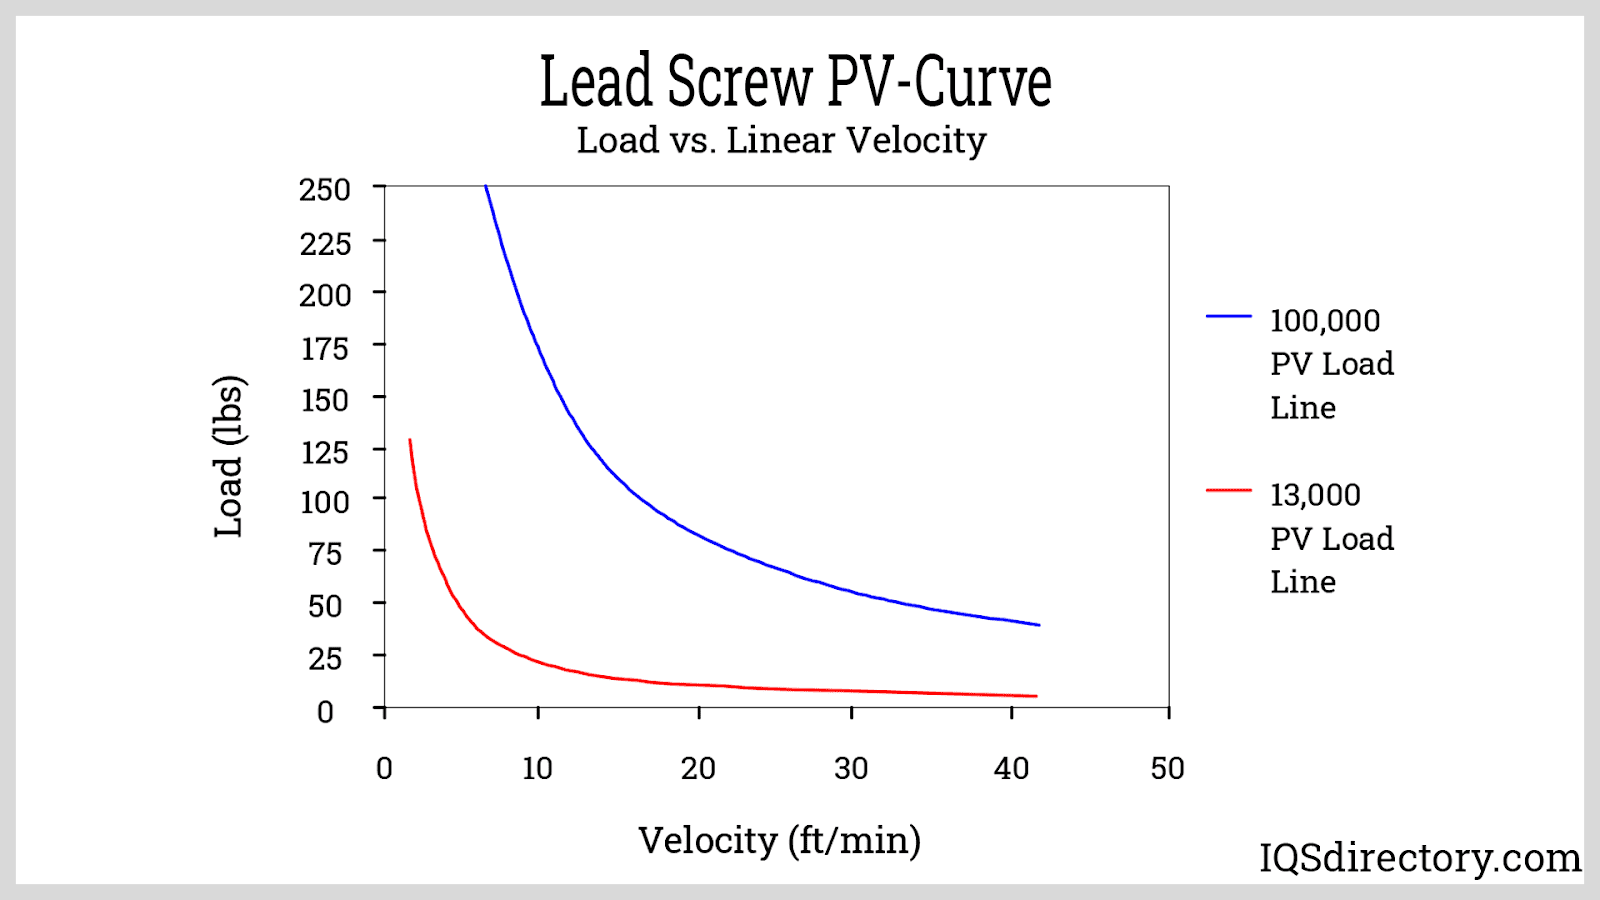 Lead Screw PV-Curve